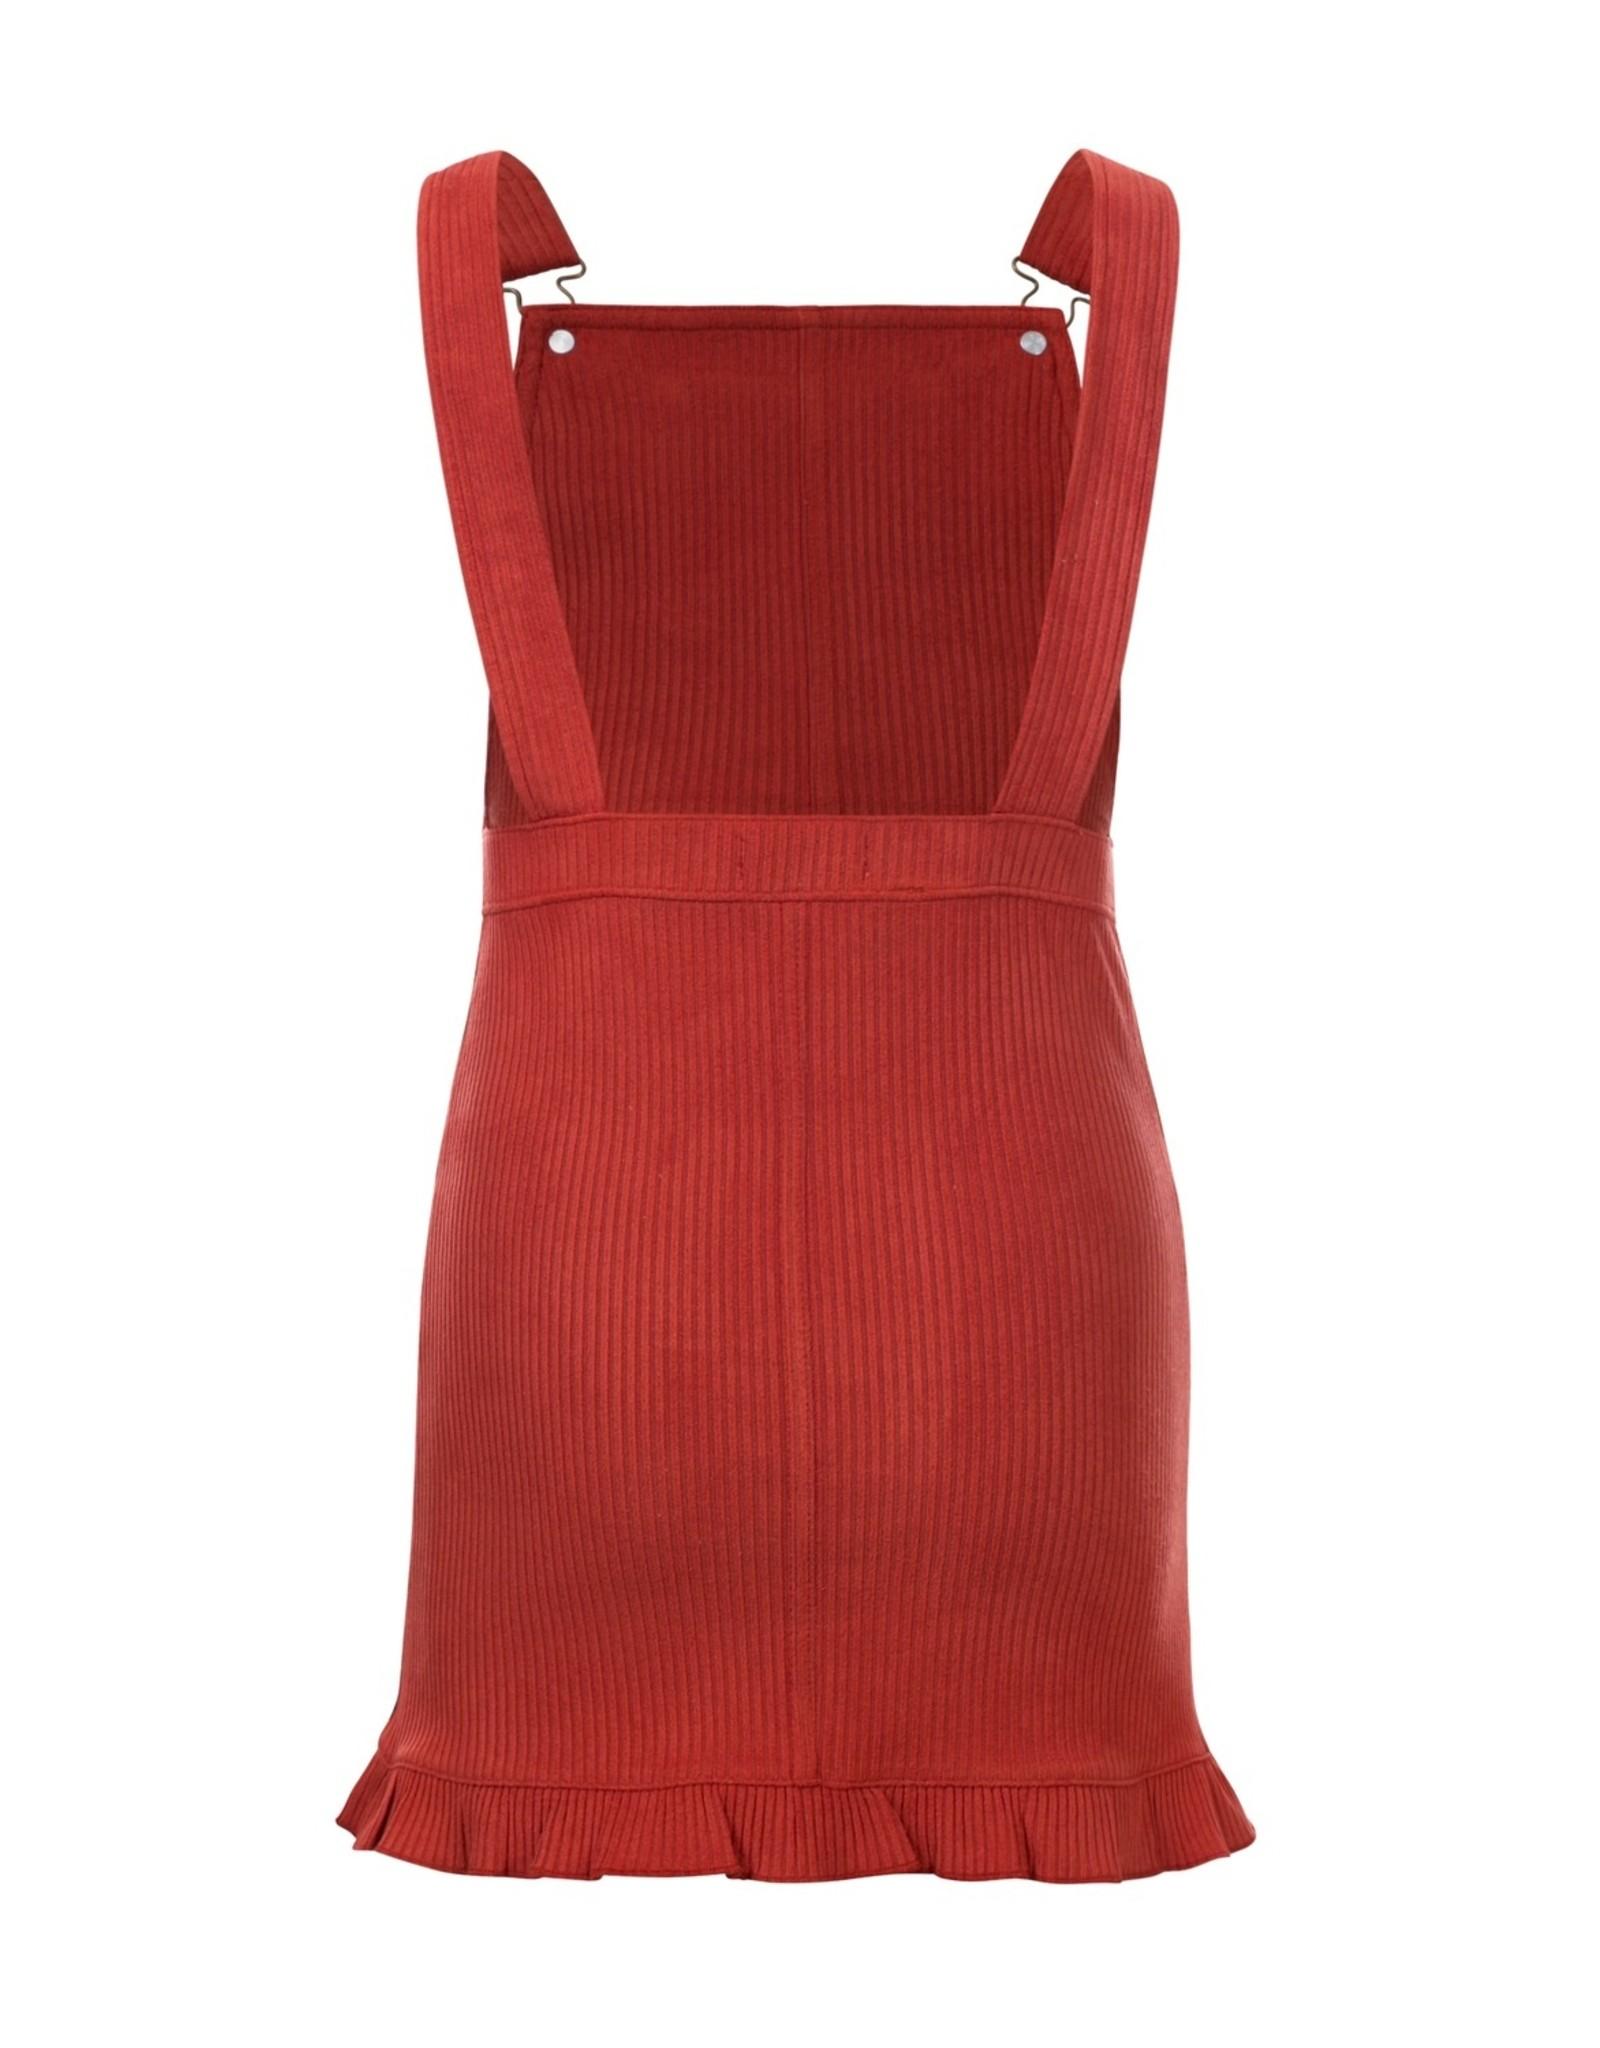 LOOXS Little Little salopette dress,  ginger